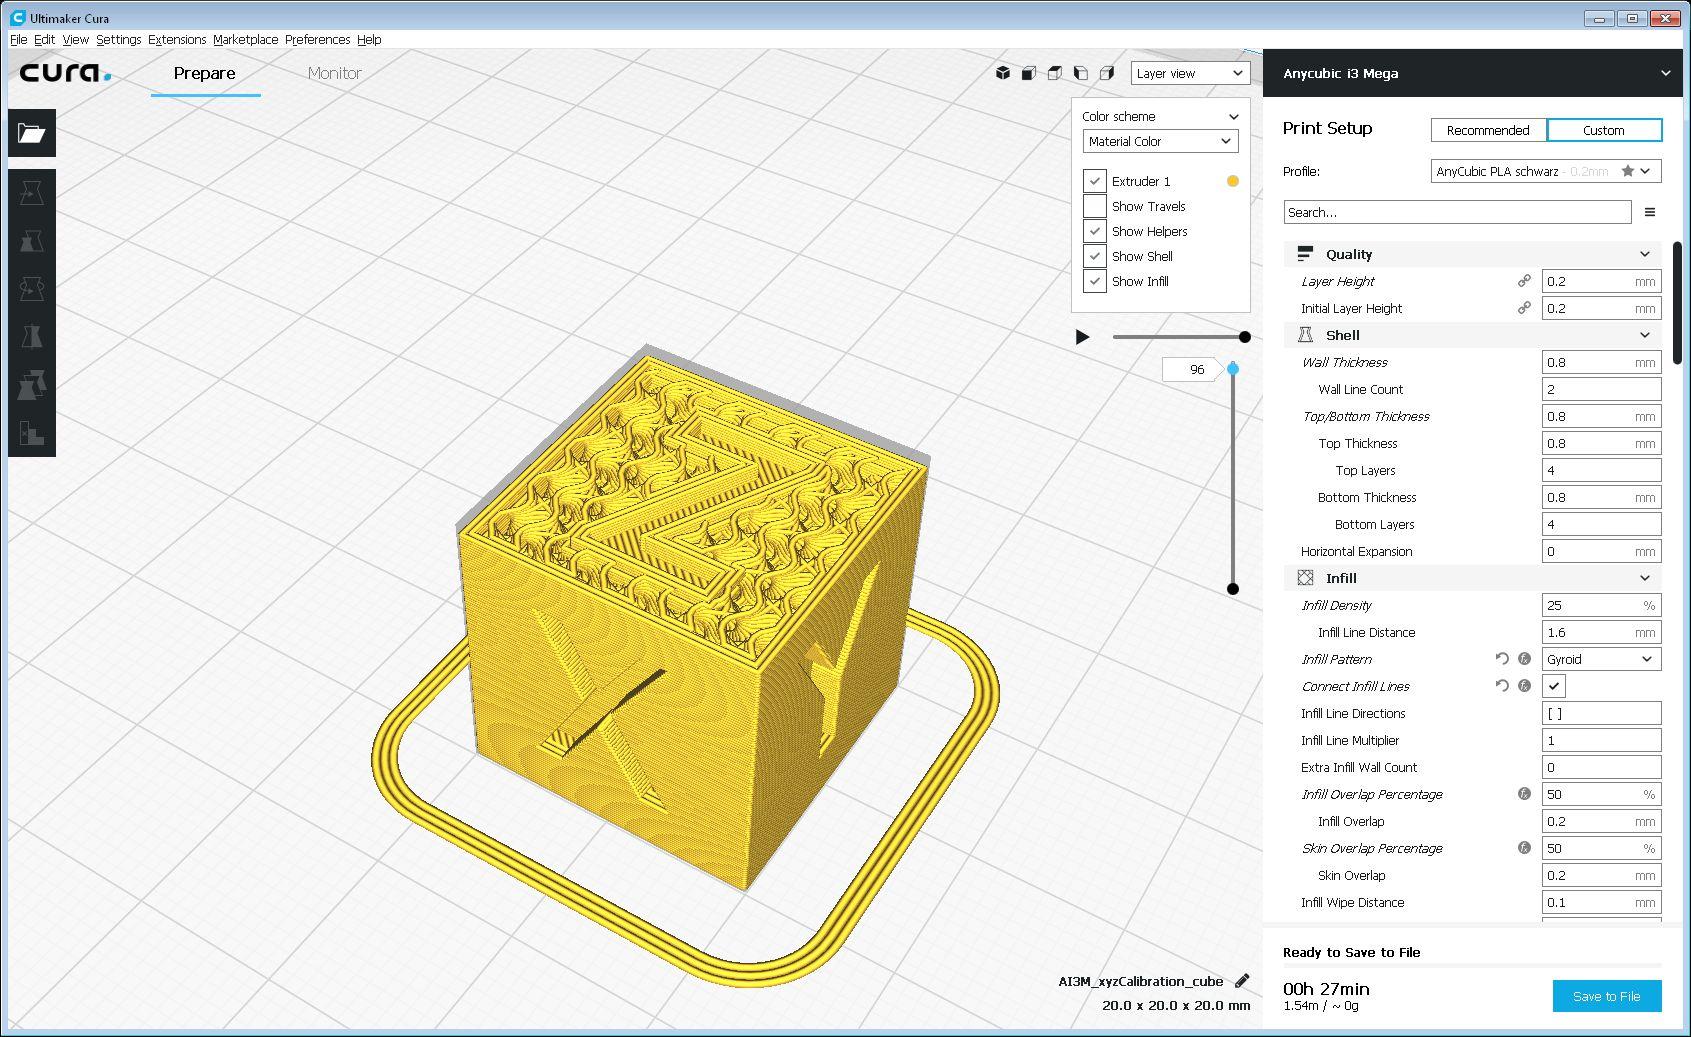 3D-Druck / Der 3D-Drucker Anycubic i3 Mega - Aufbau